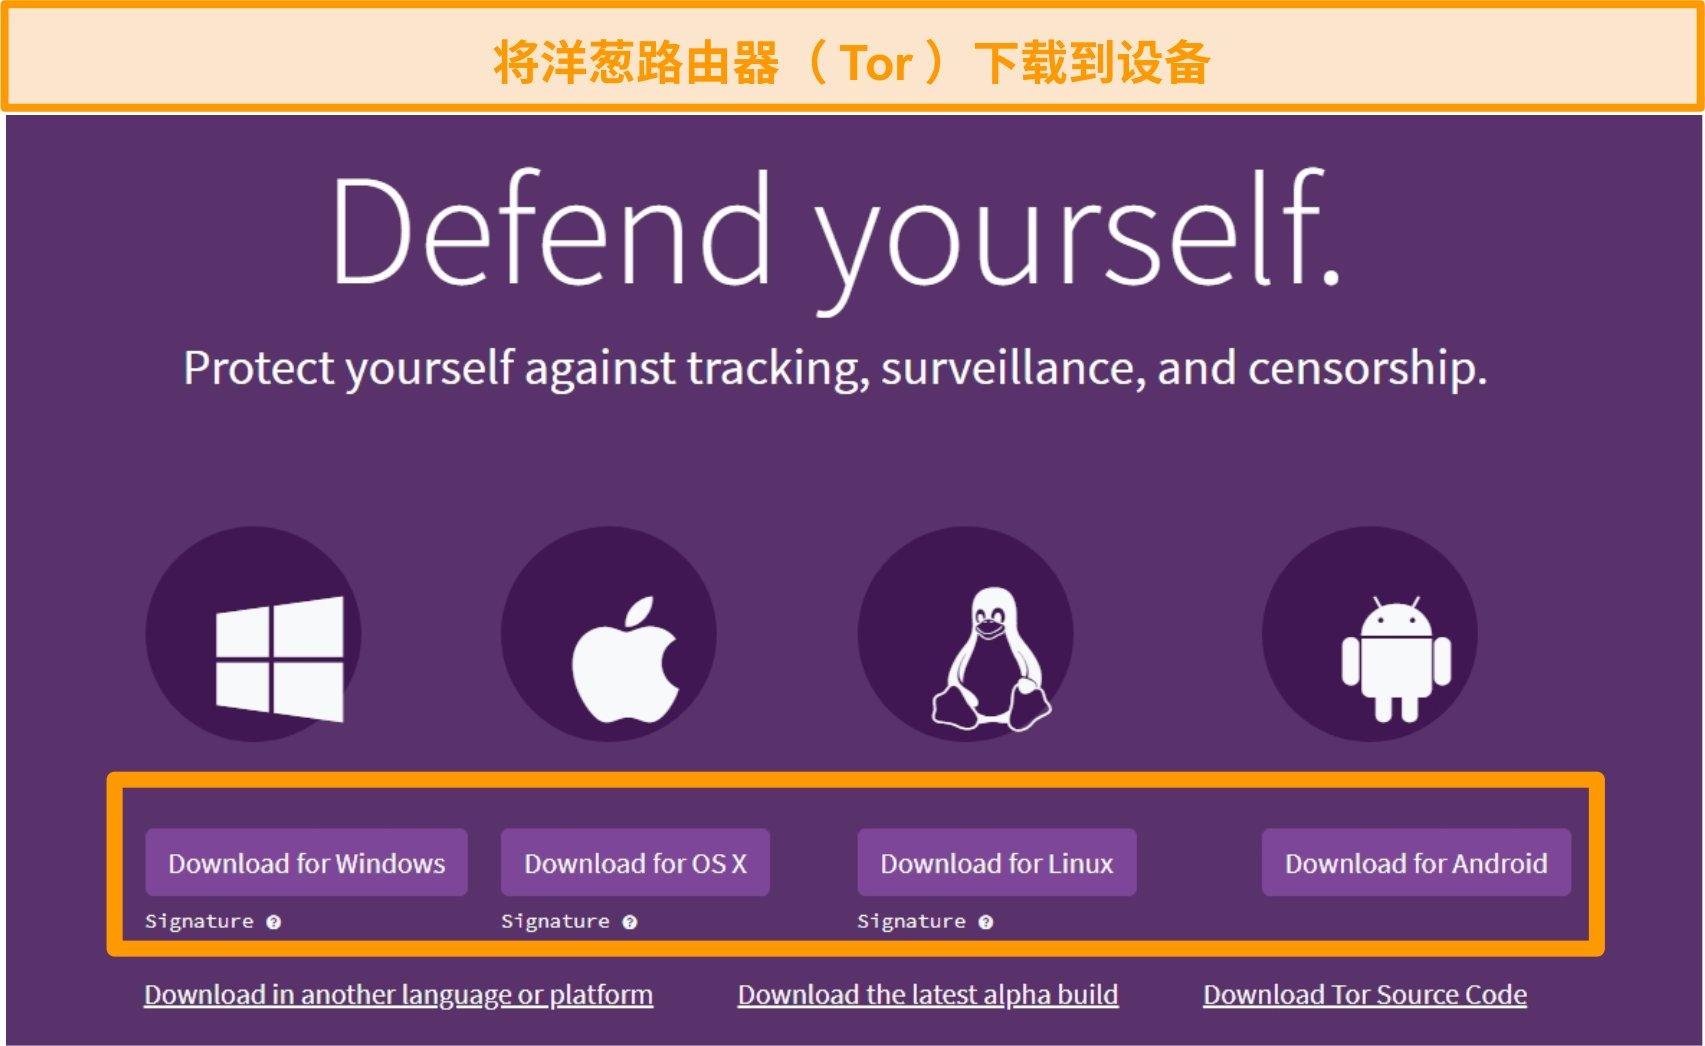 Tor项目下载页面概述的屏幕快照